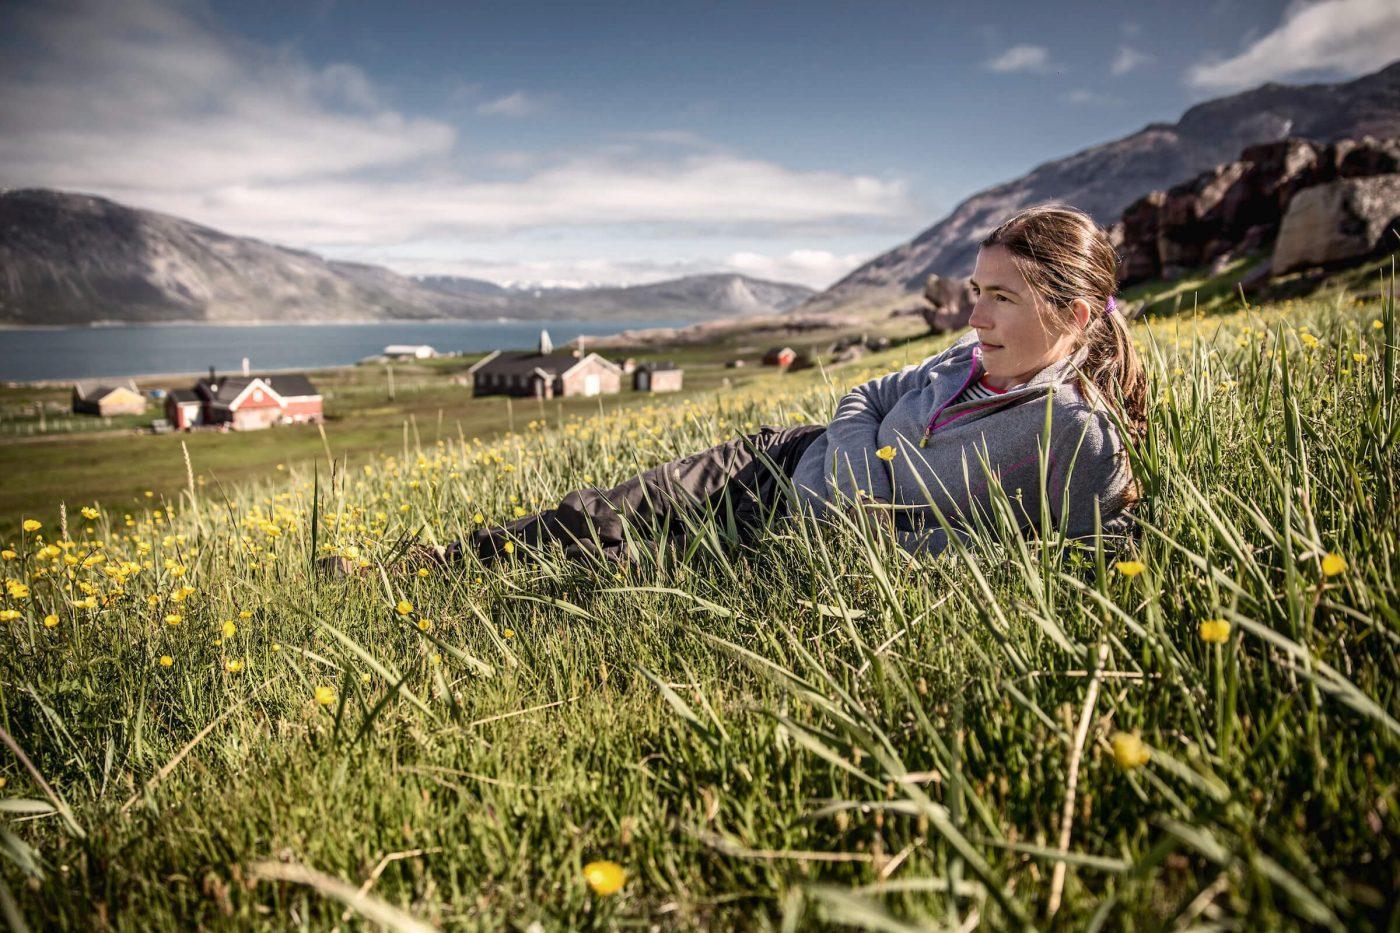 A traveler enjoying the summer sun in Igaliku in South Greenland. By Mads Pihl